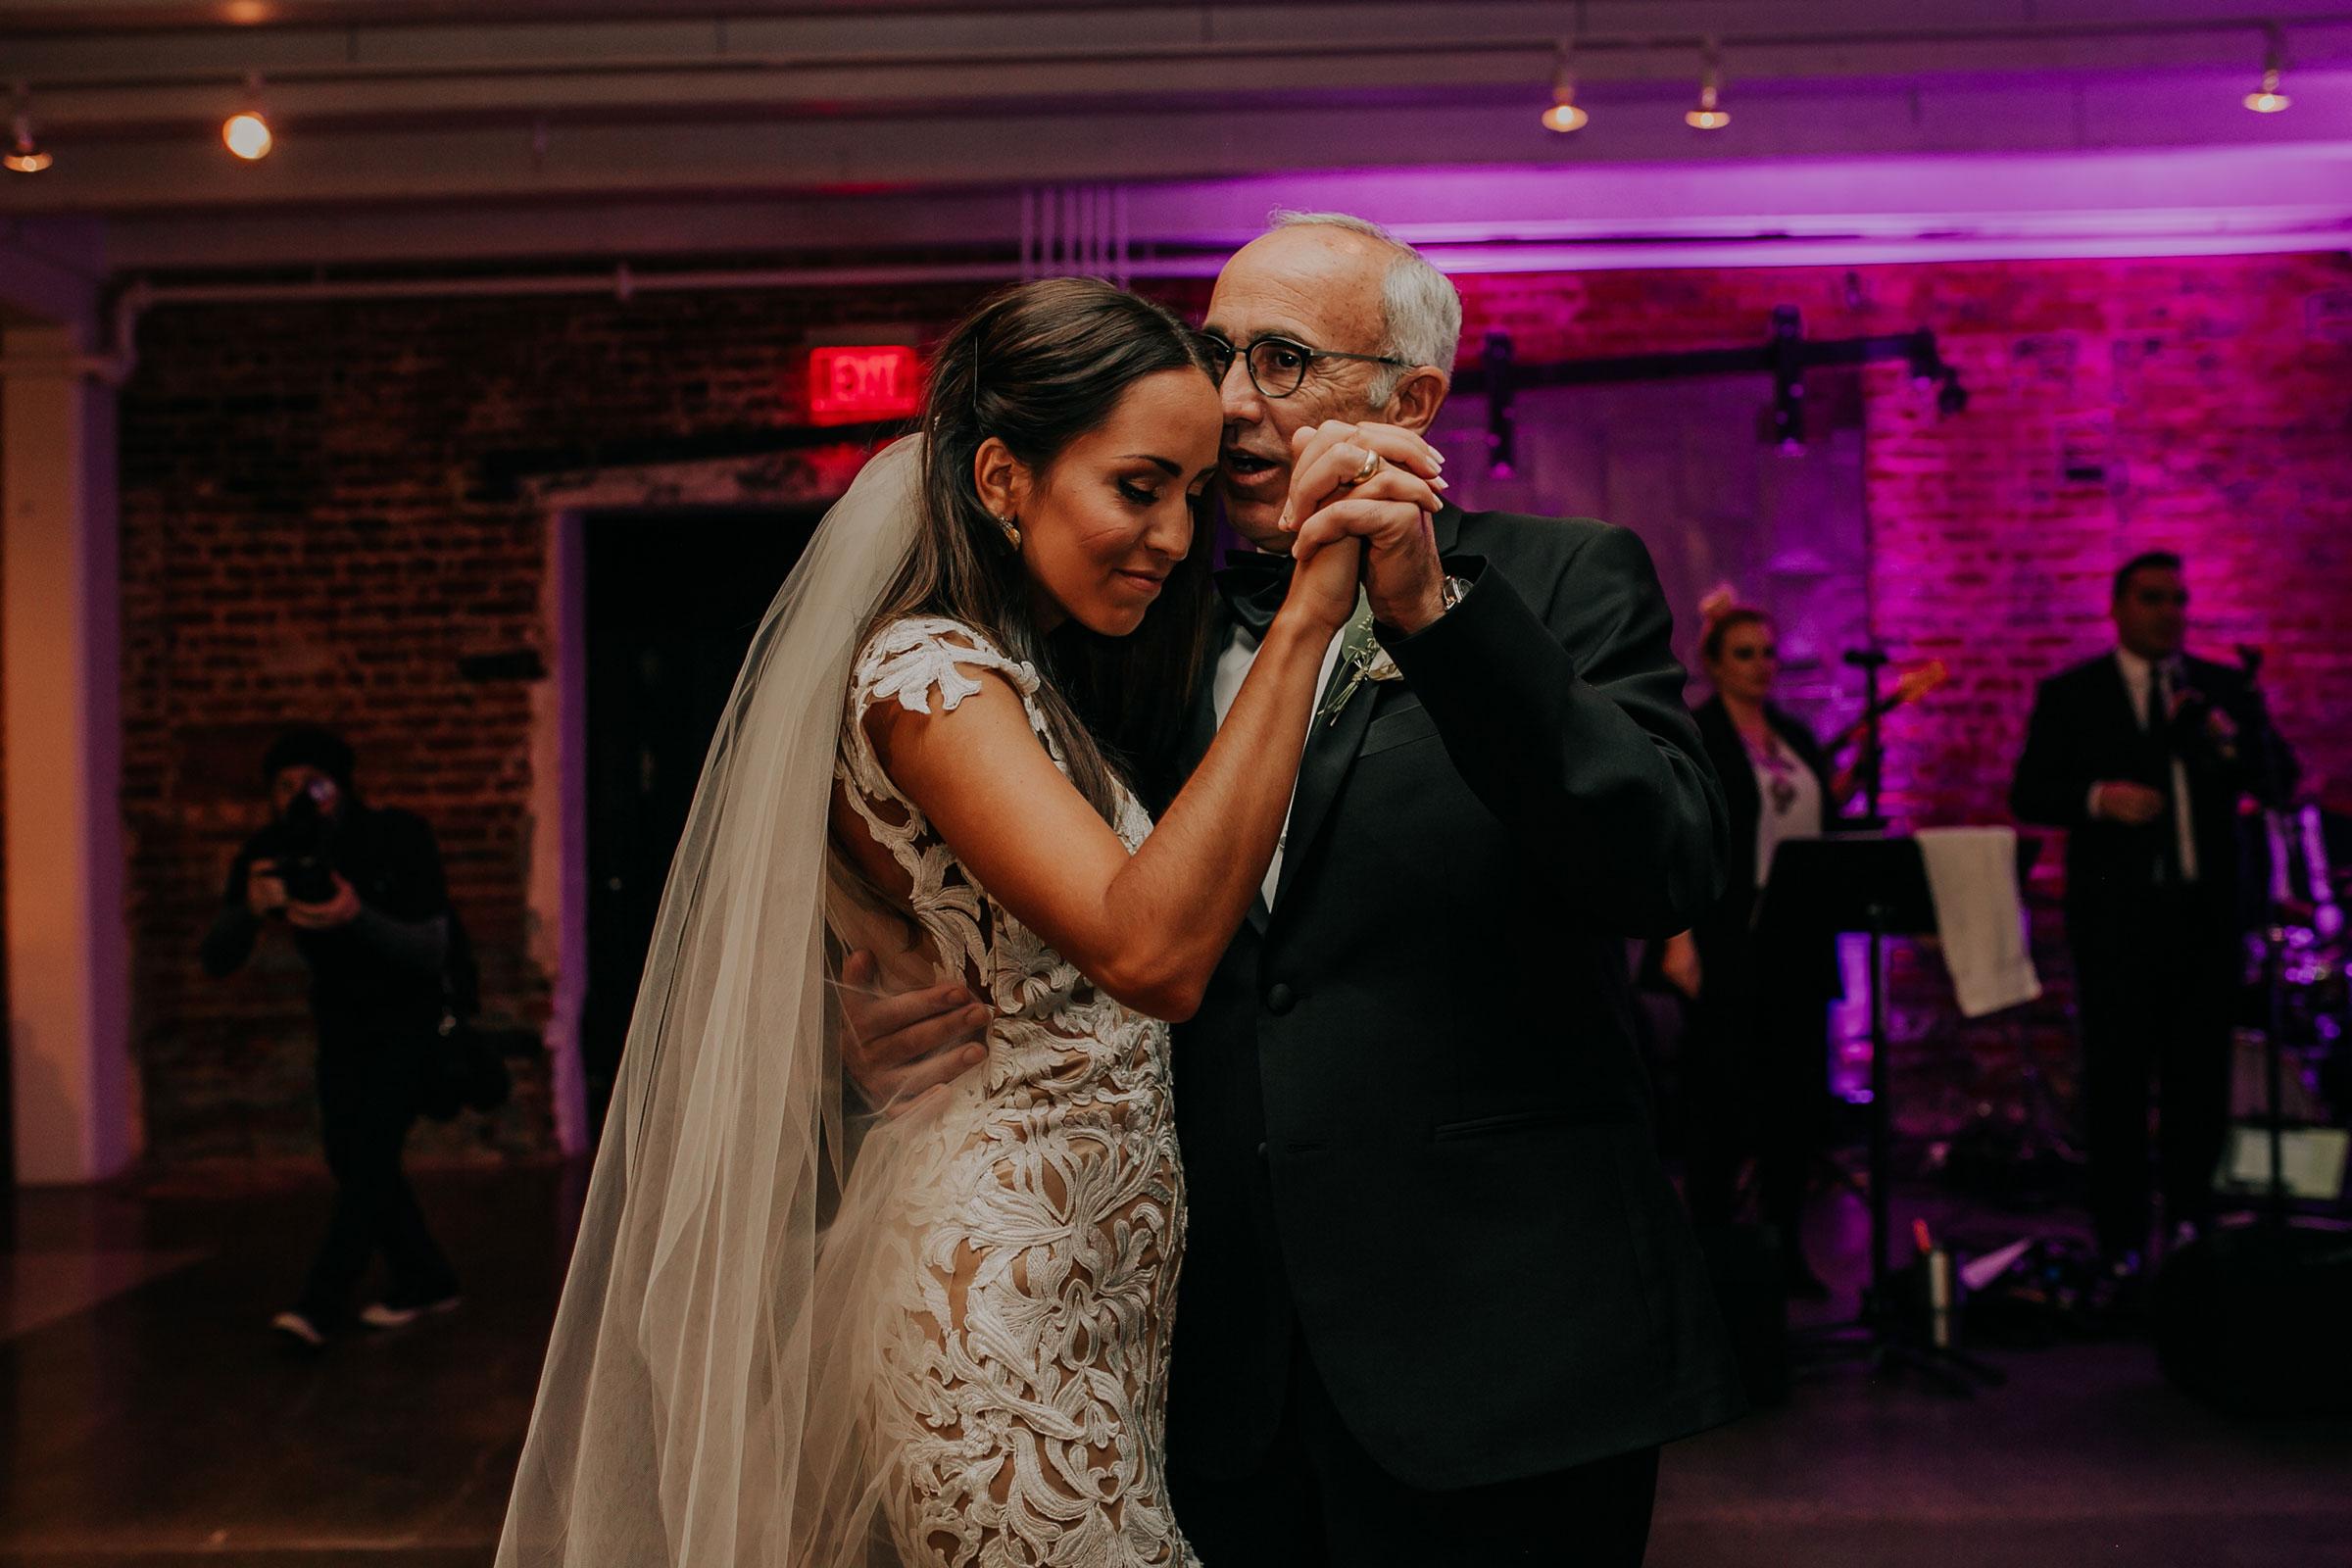 father-daughter-on-dance-floor-slow-dance-founders-one-nine-omaha-nebraska-raelyn-ramey-photography.jpg